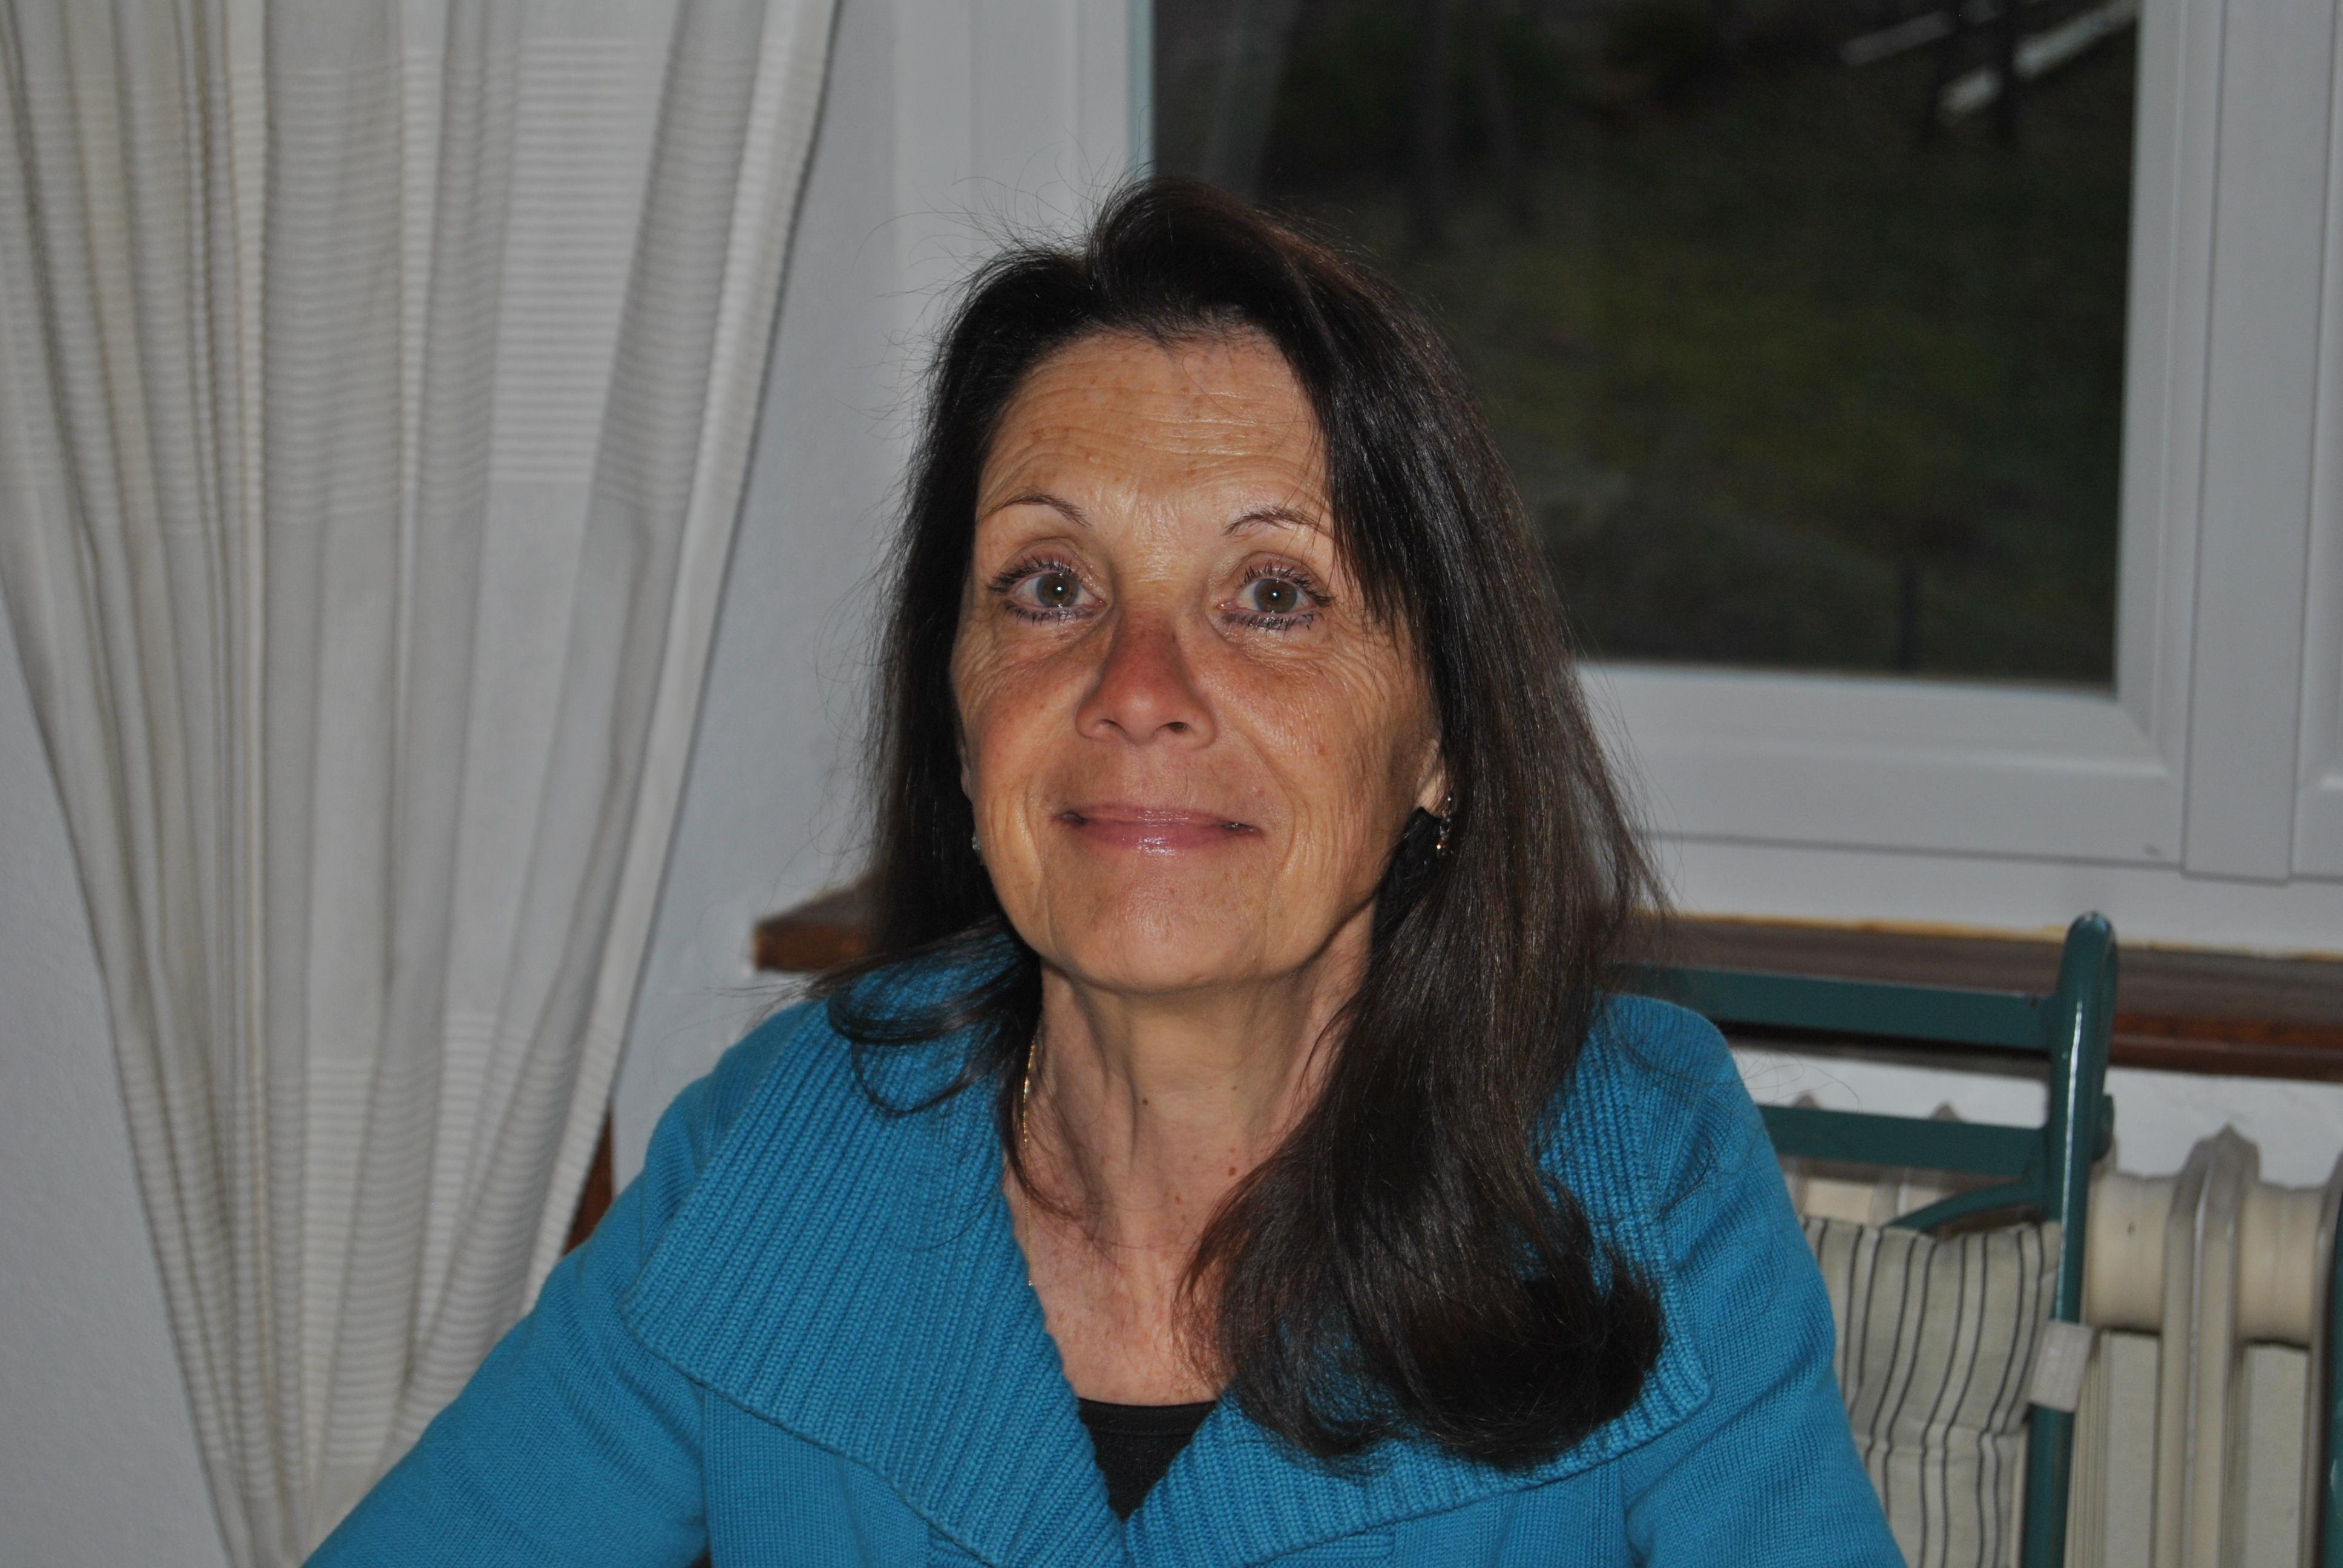 Jacqueline Lefort